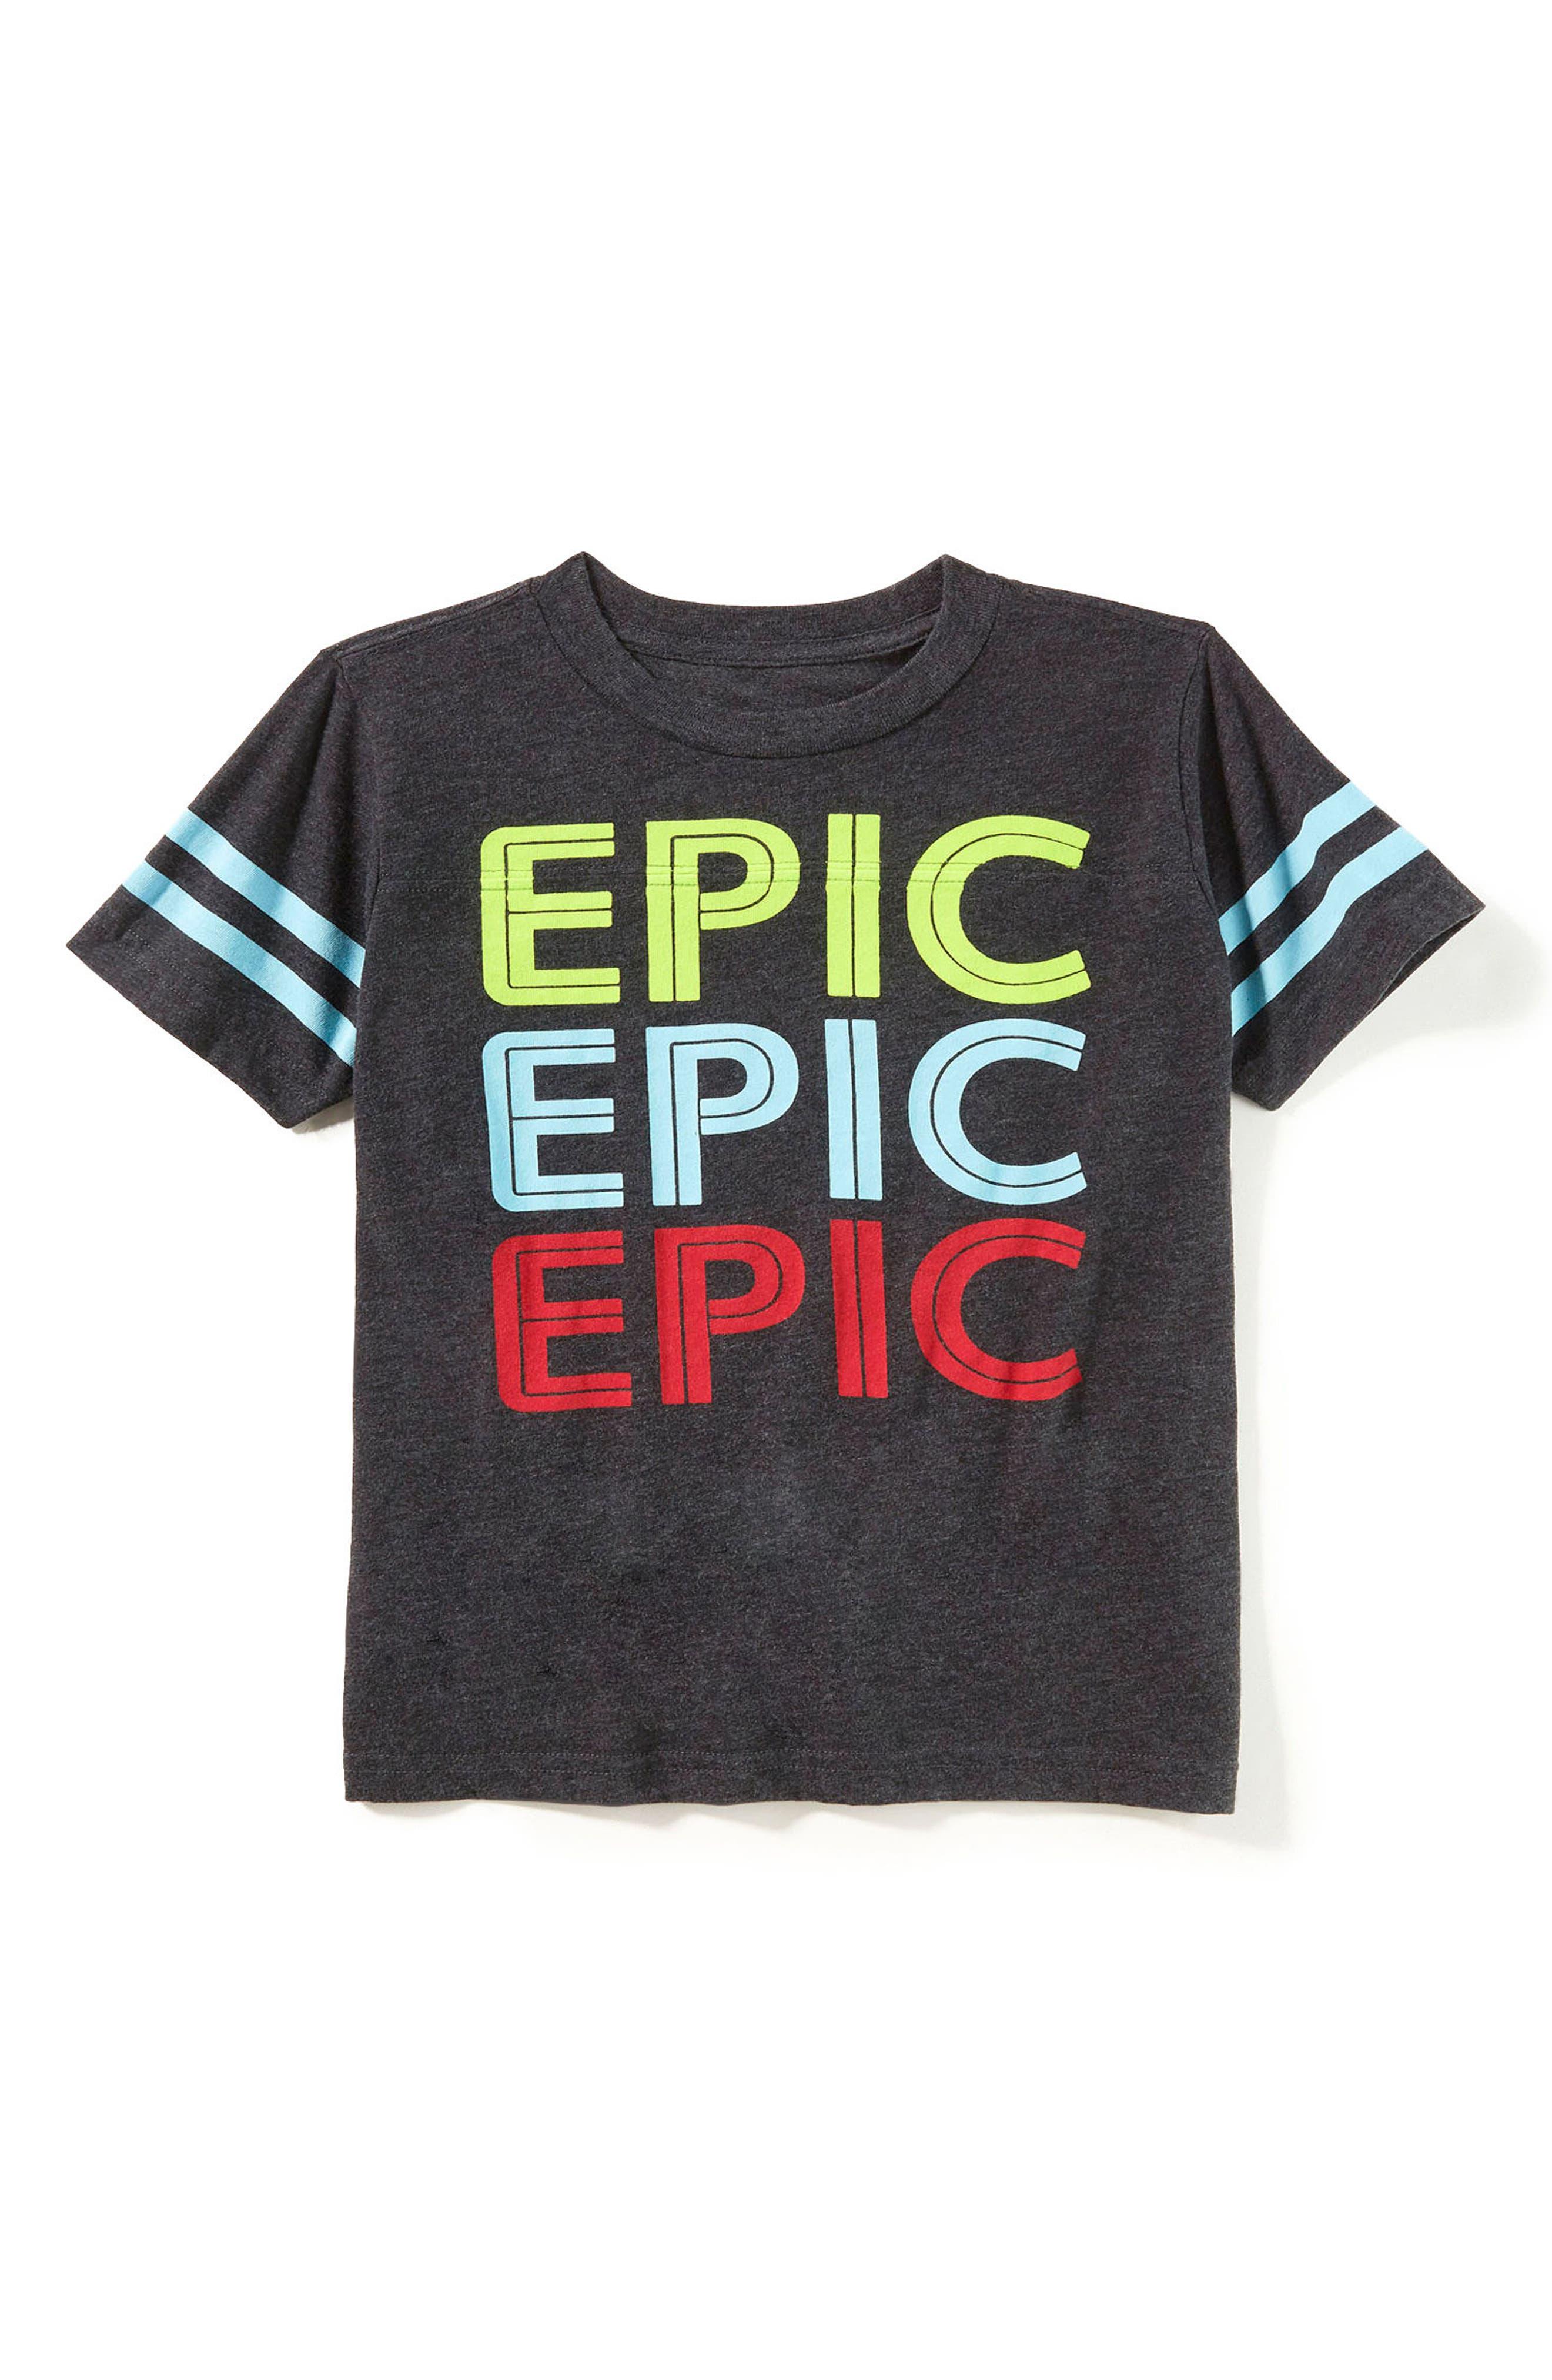 Alternate Image 1 Selected - Peek Epic Graphic T-Shirt (Toddler Boys, Little Boys & Big Boys)